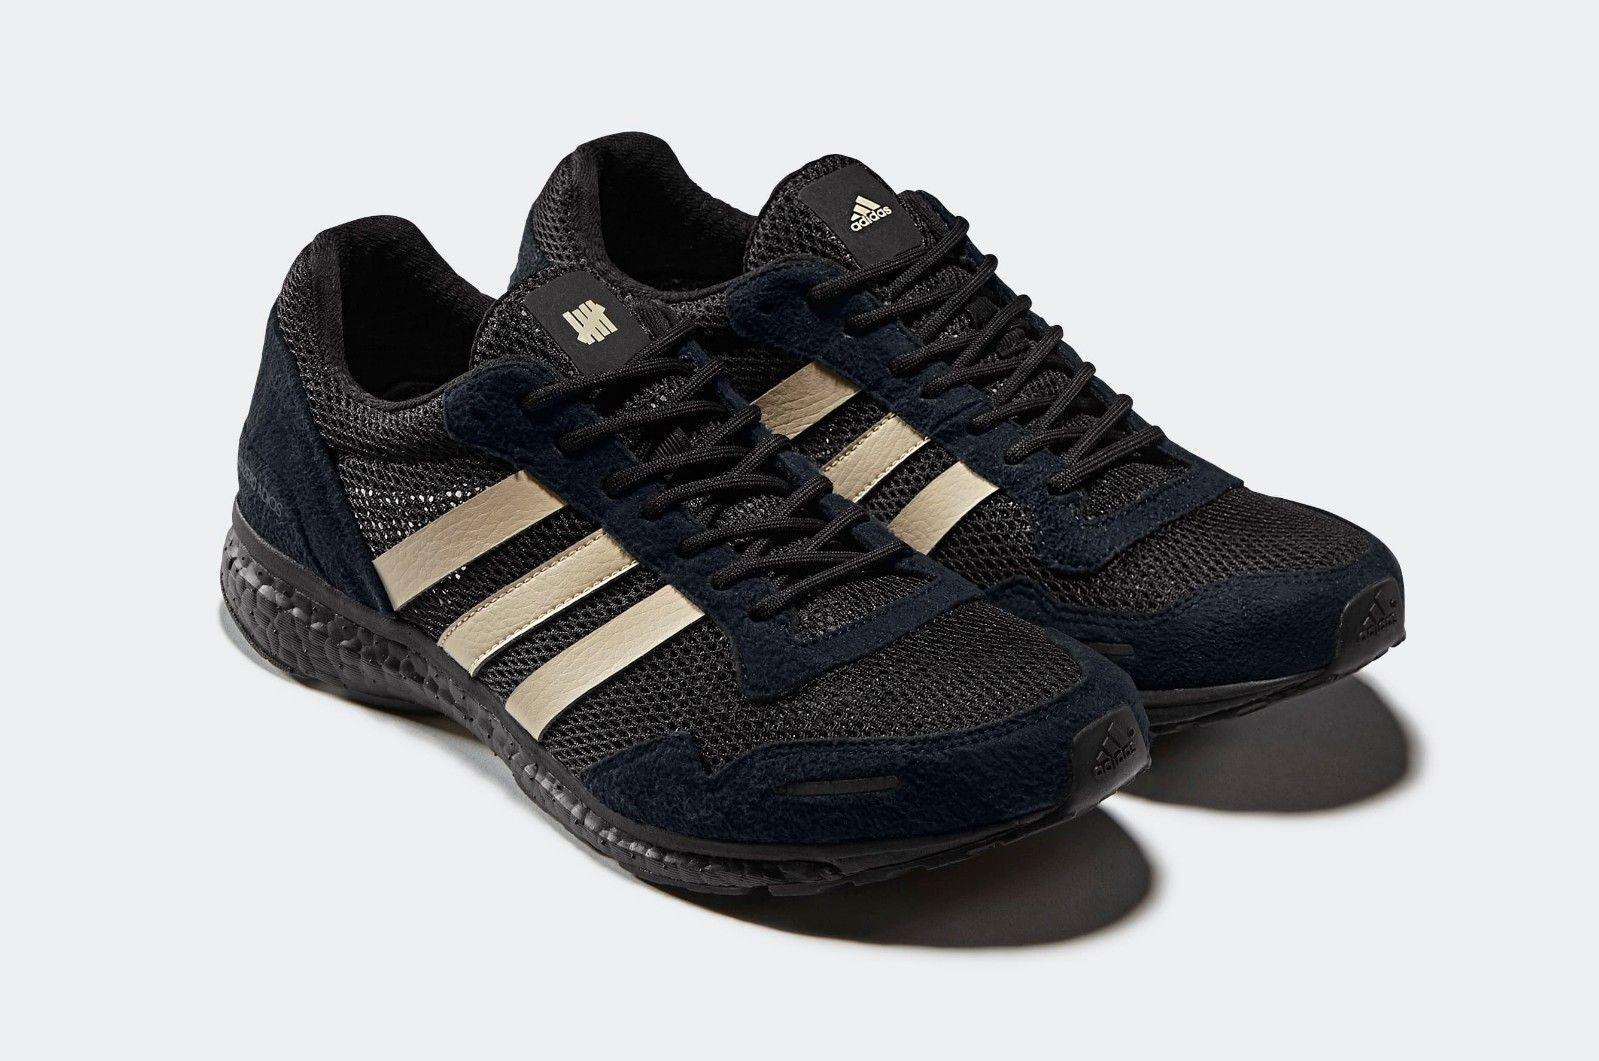 Adidas impulso x imbattuto adizero misura 12,5 nero tan.b22483 undftd.ultra impulso Adidas nmd 158acd